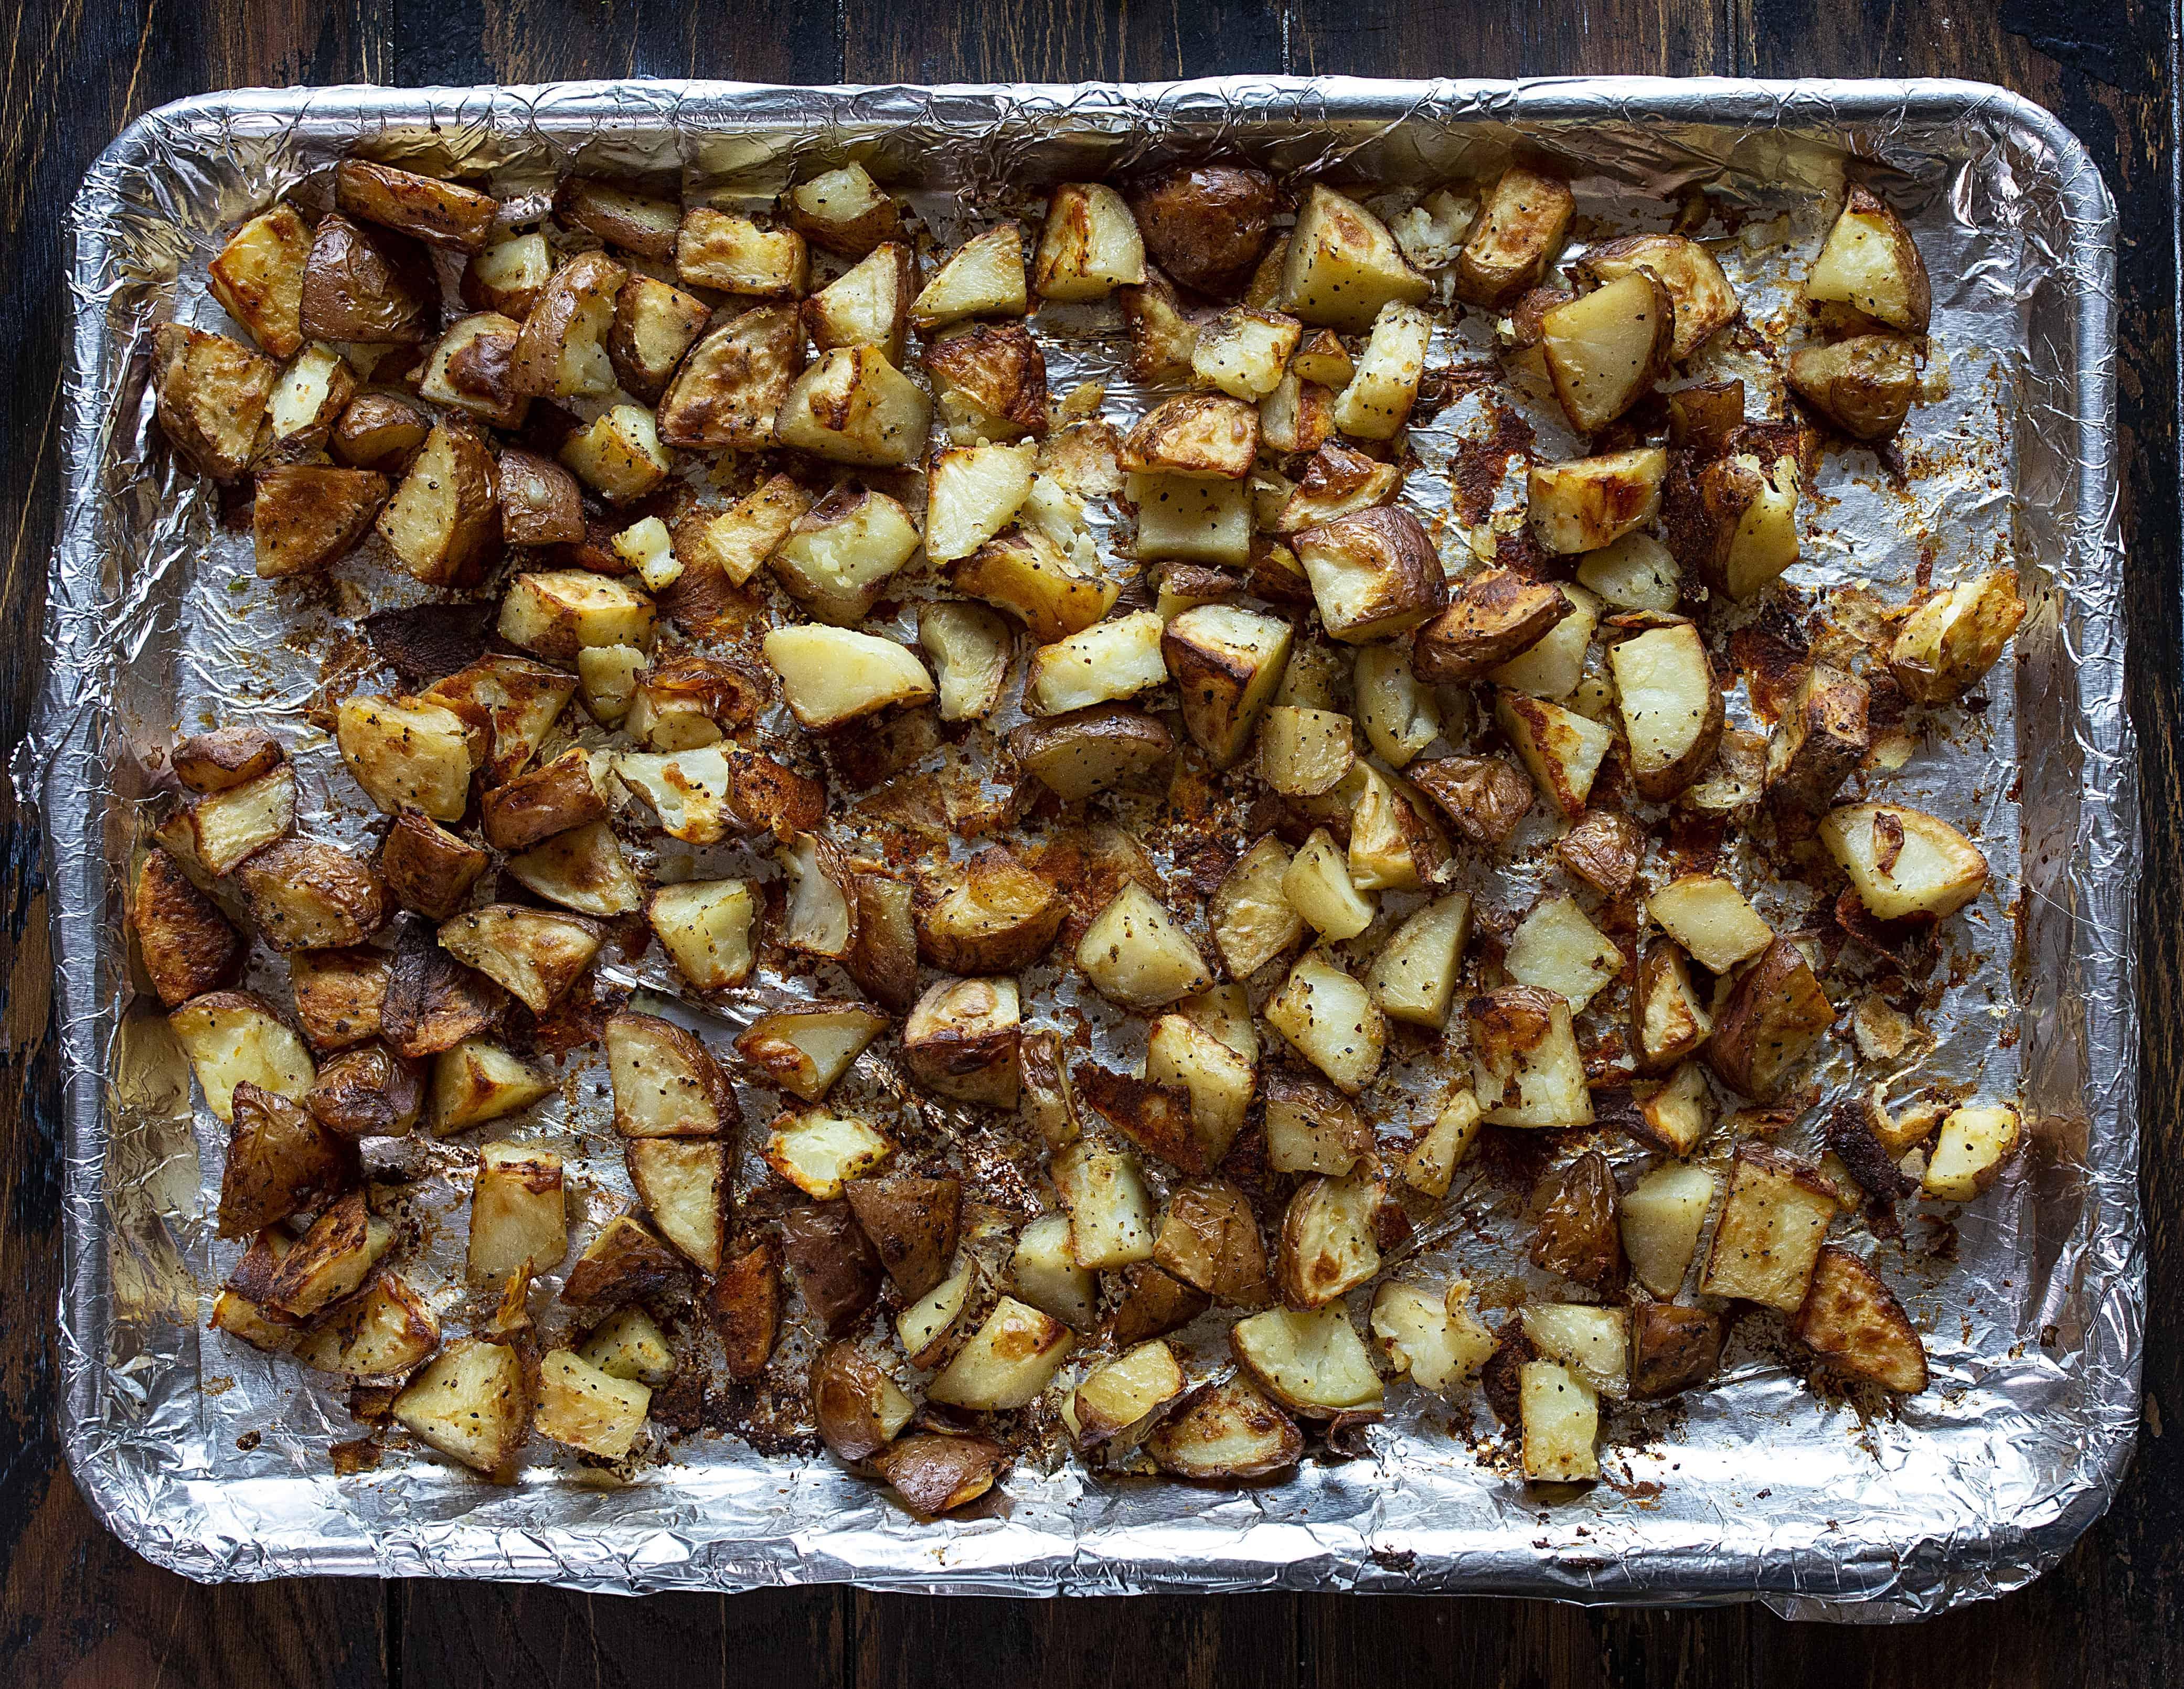 Roasted Potatoes for Potato Salad